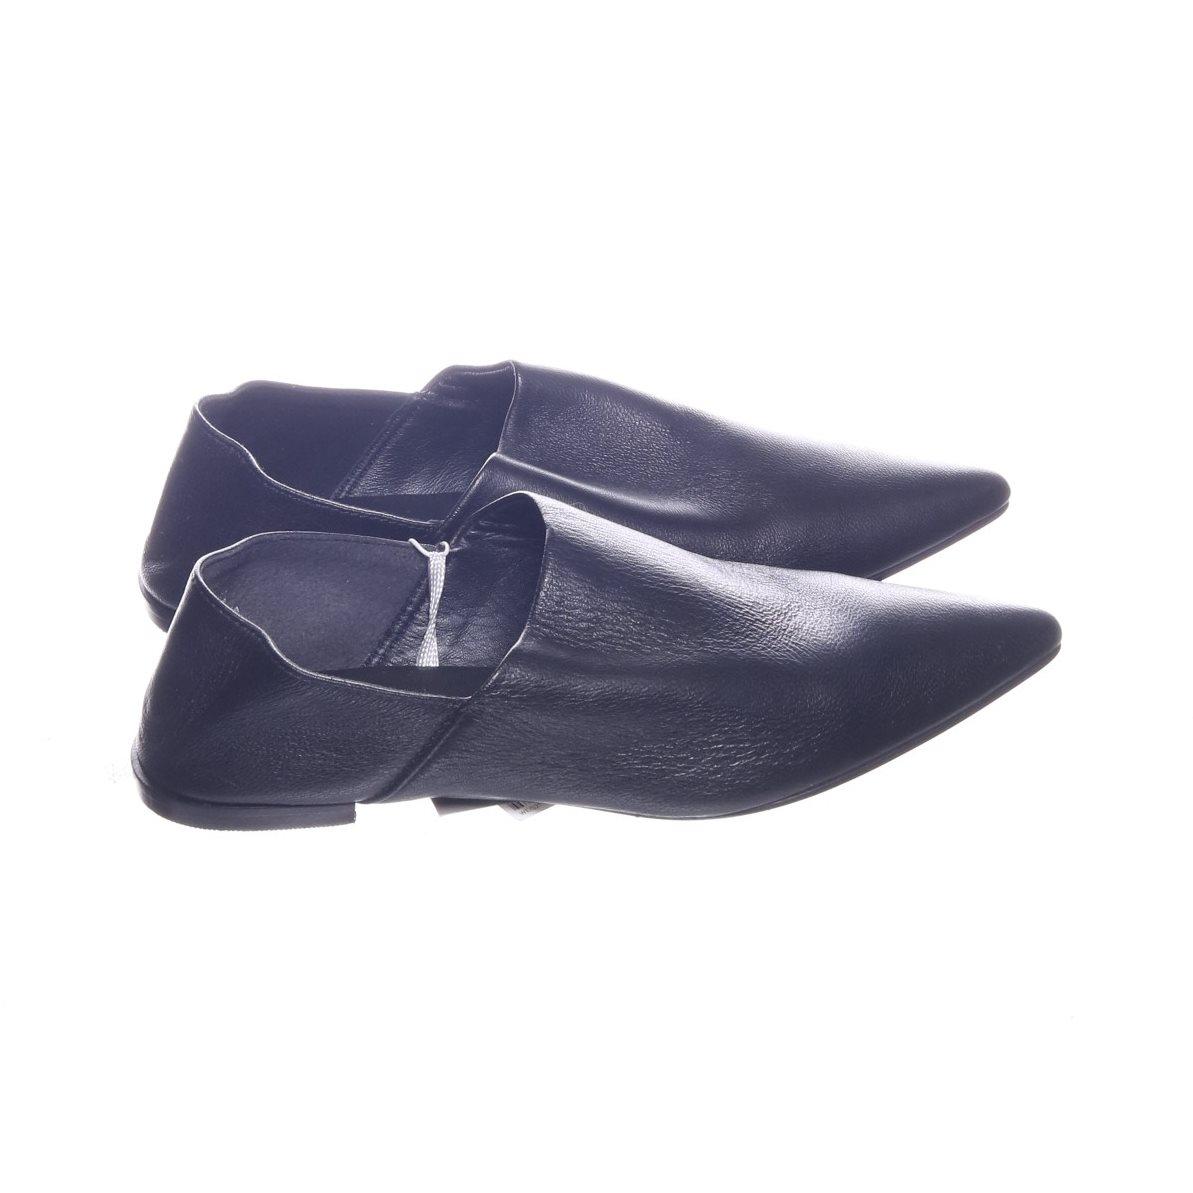 1ad48277d70 H&M, Loafers, Strl: 37, Svart, Skinn (344070872) ᐈ Sellpy på Tradera